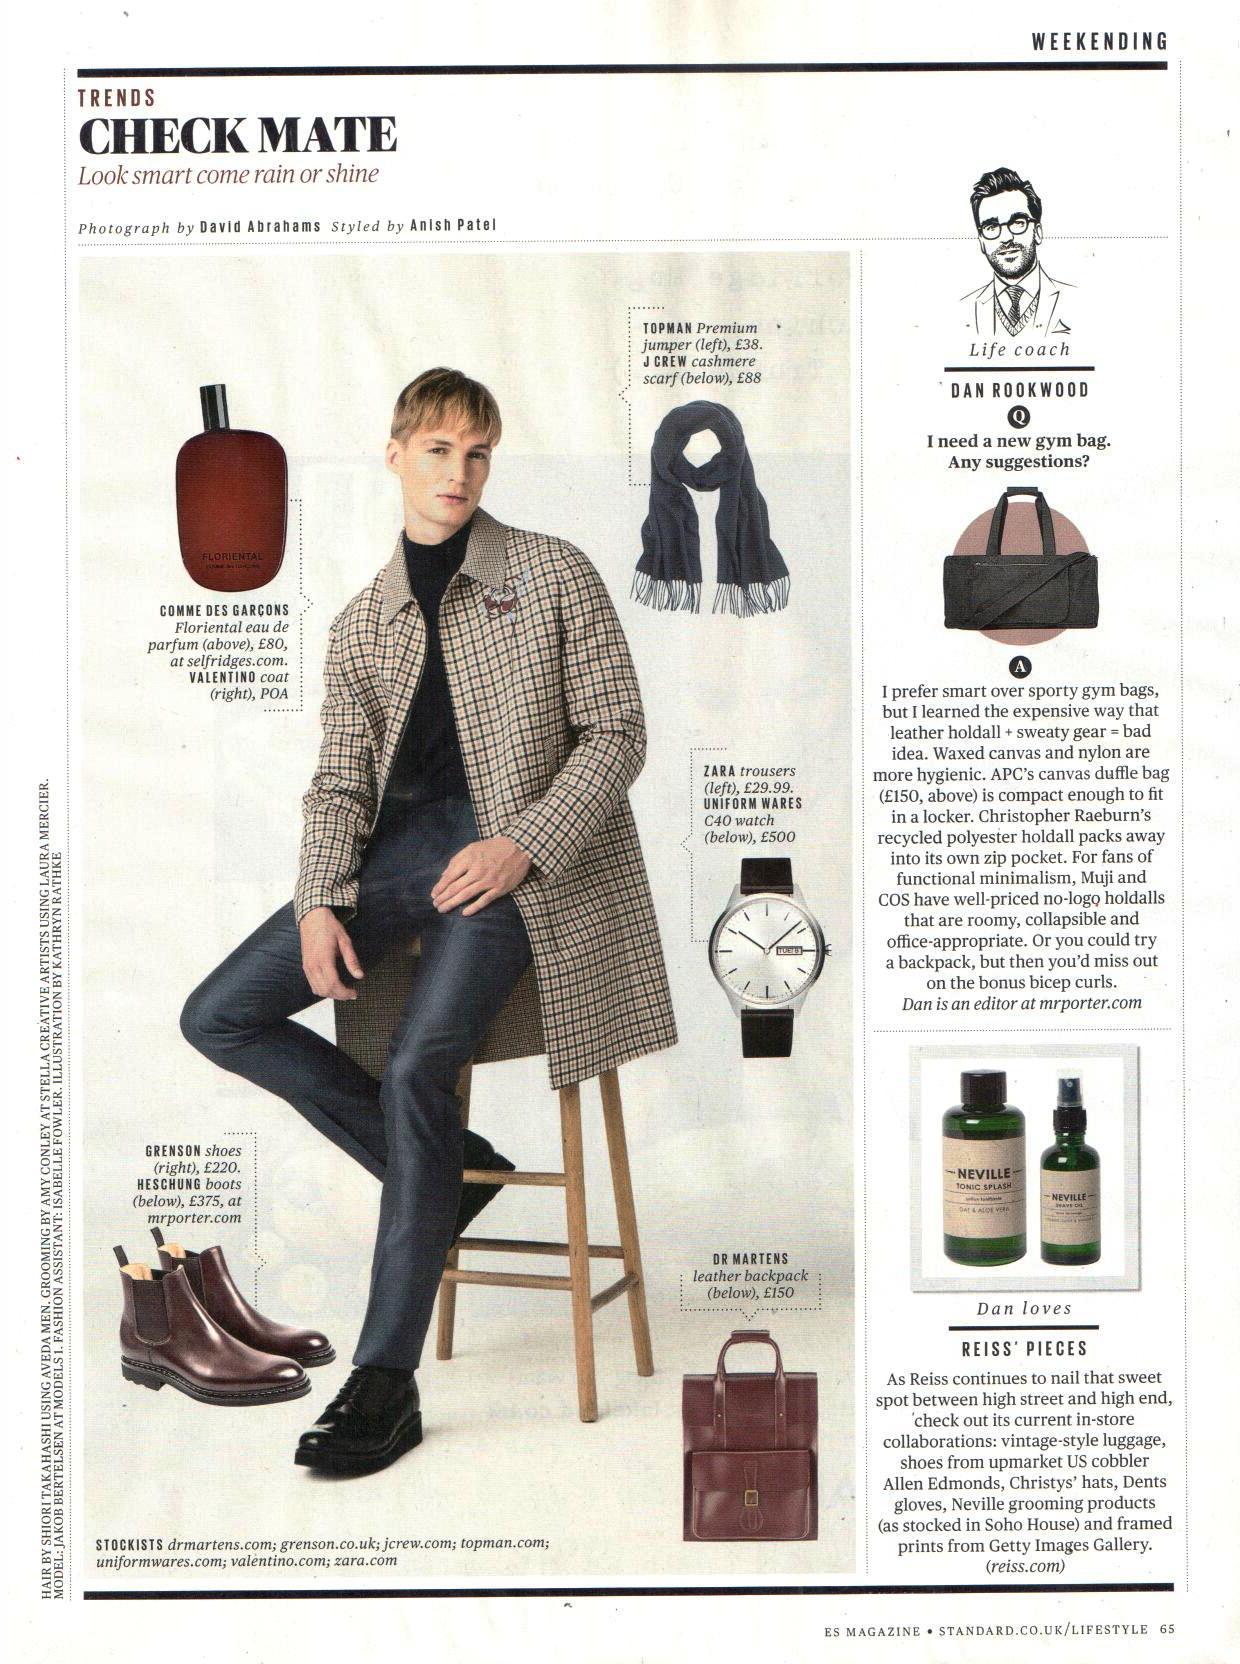 ES Magazine_13th November 2015.jpg